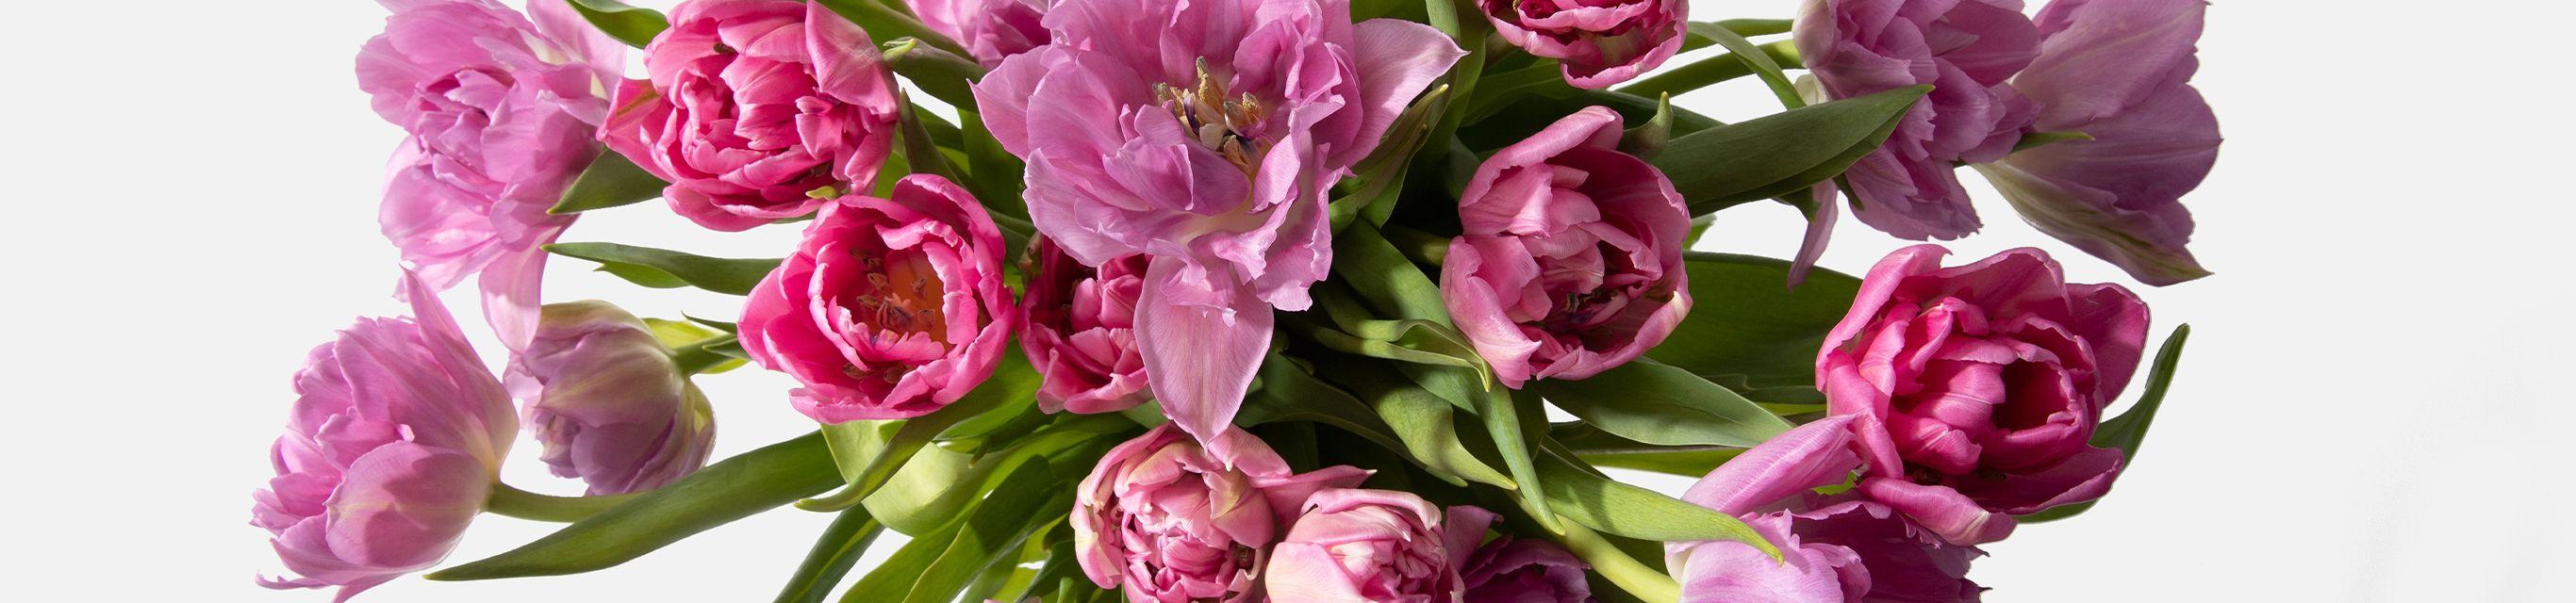 tulips flowers banner